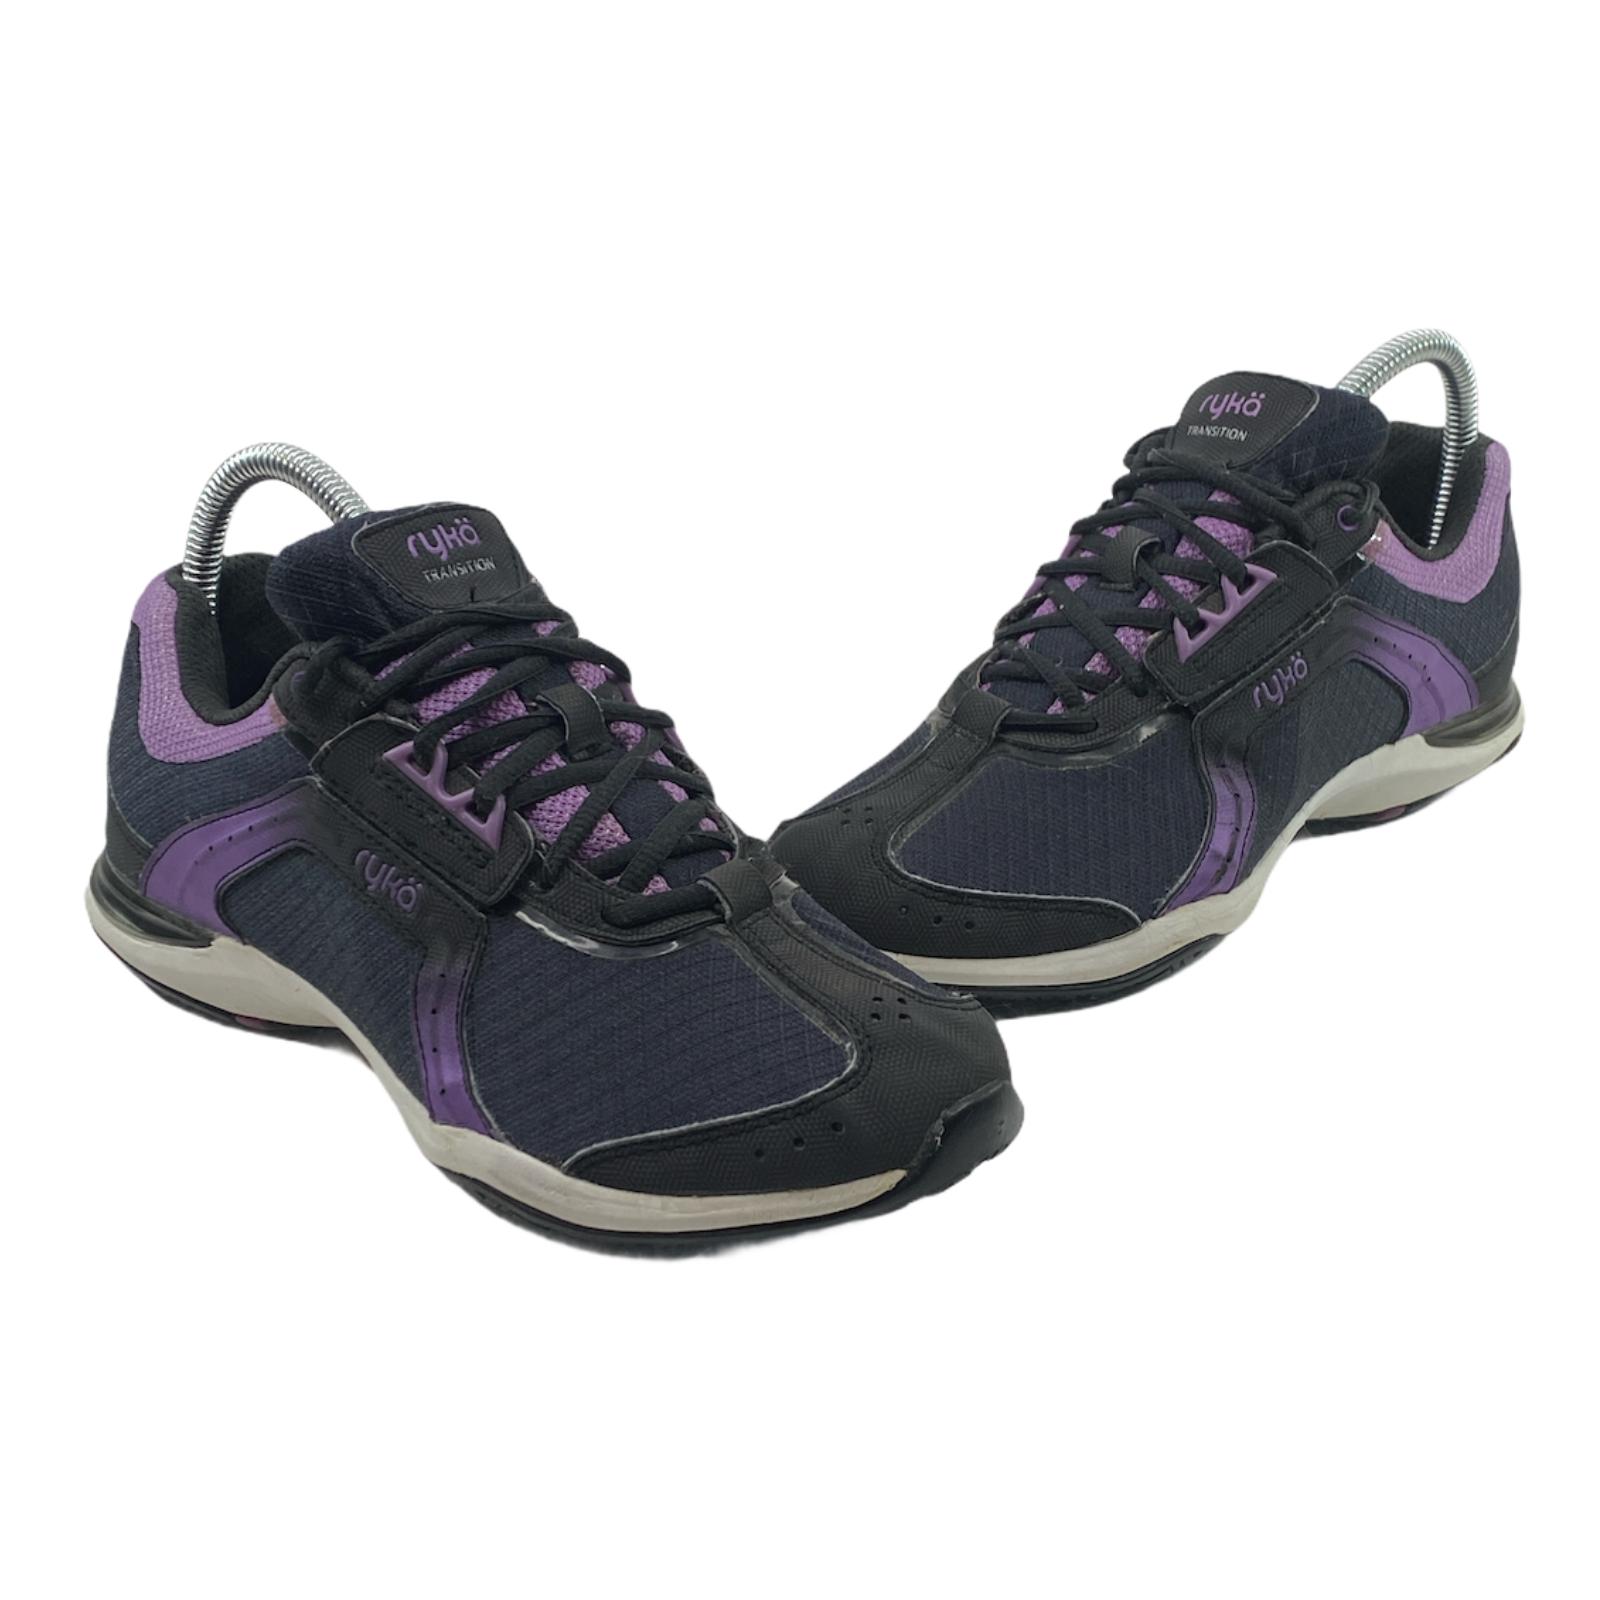 Ryka Transition Kelly Ripa femme taille us 7 Noir Violet entraînement Athlétique Chaussures